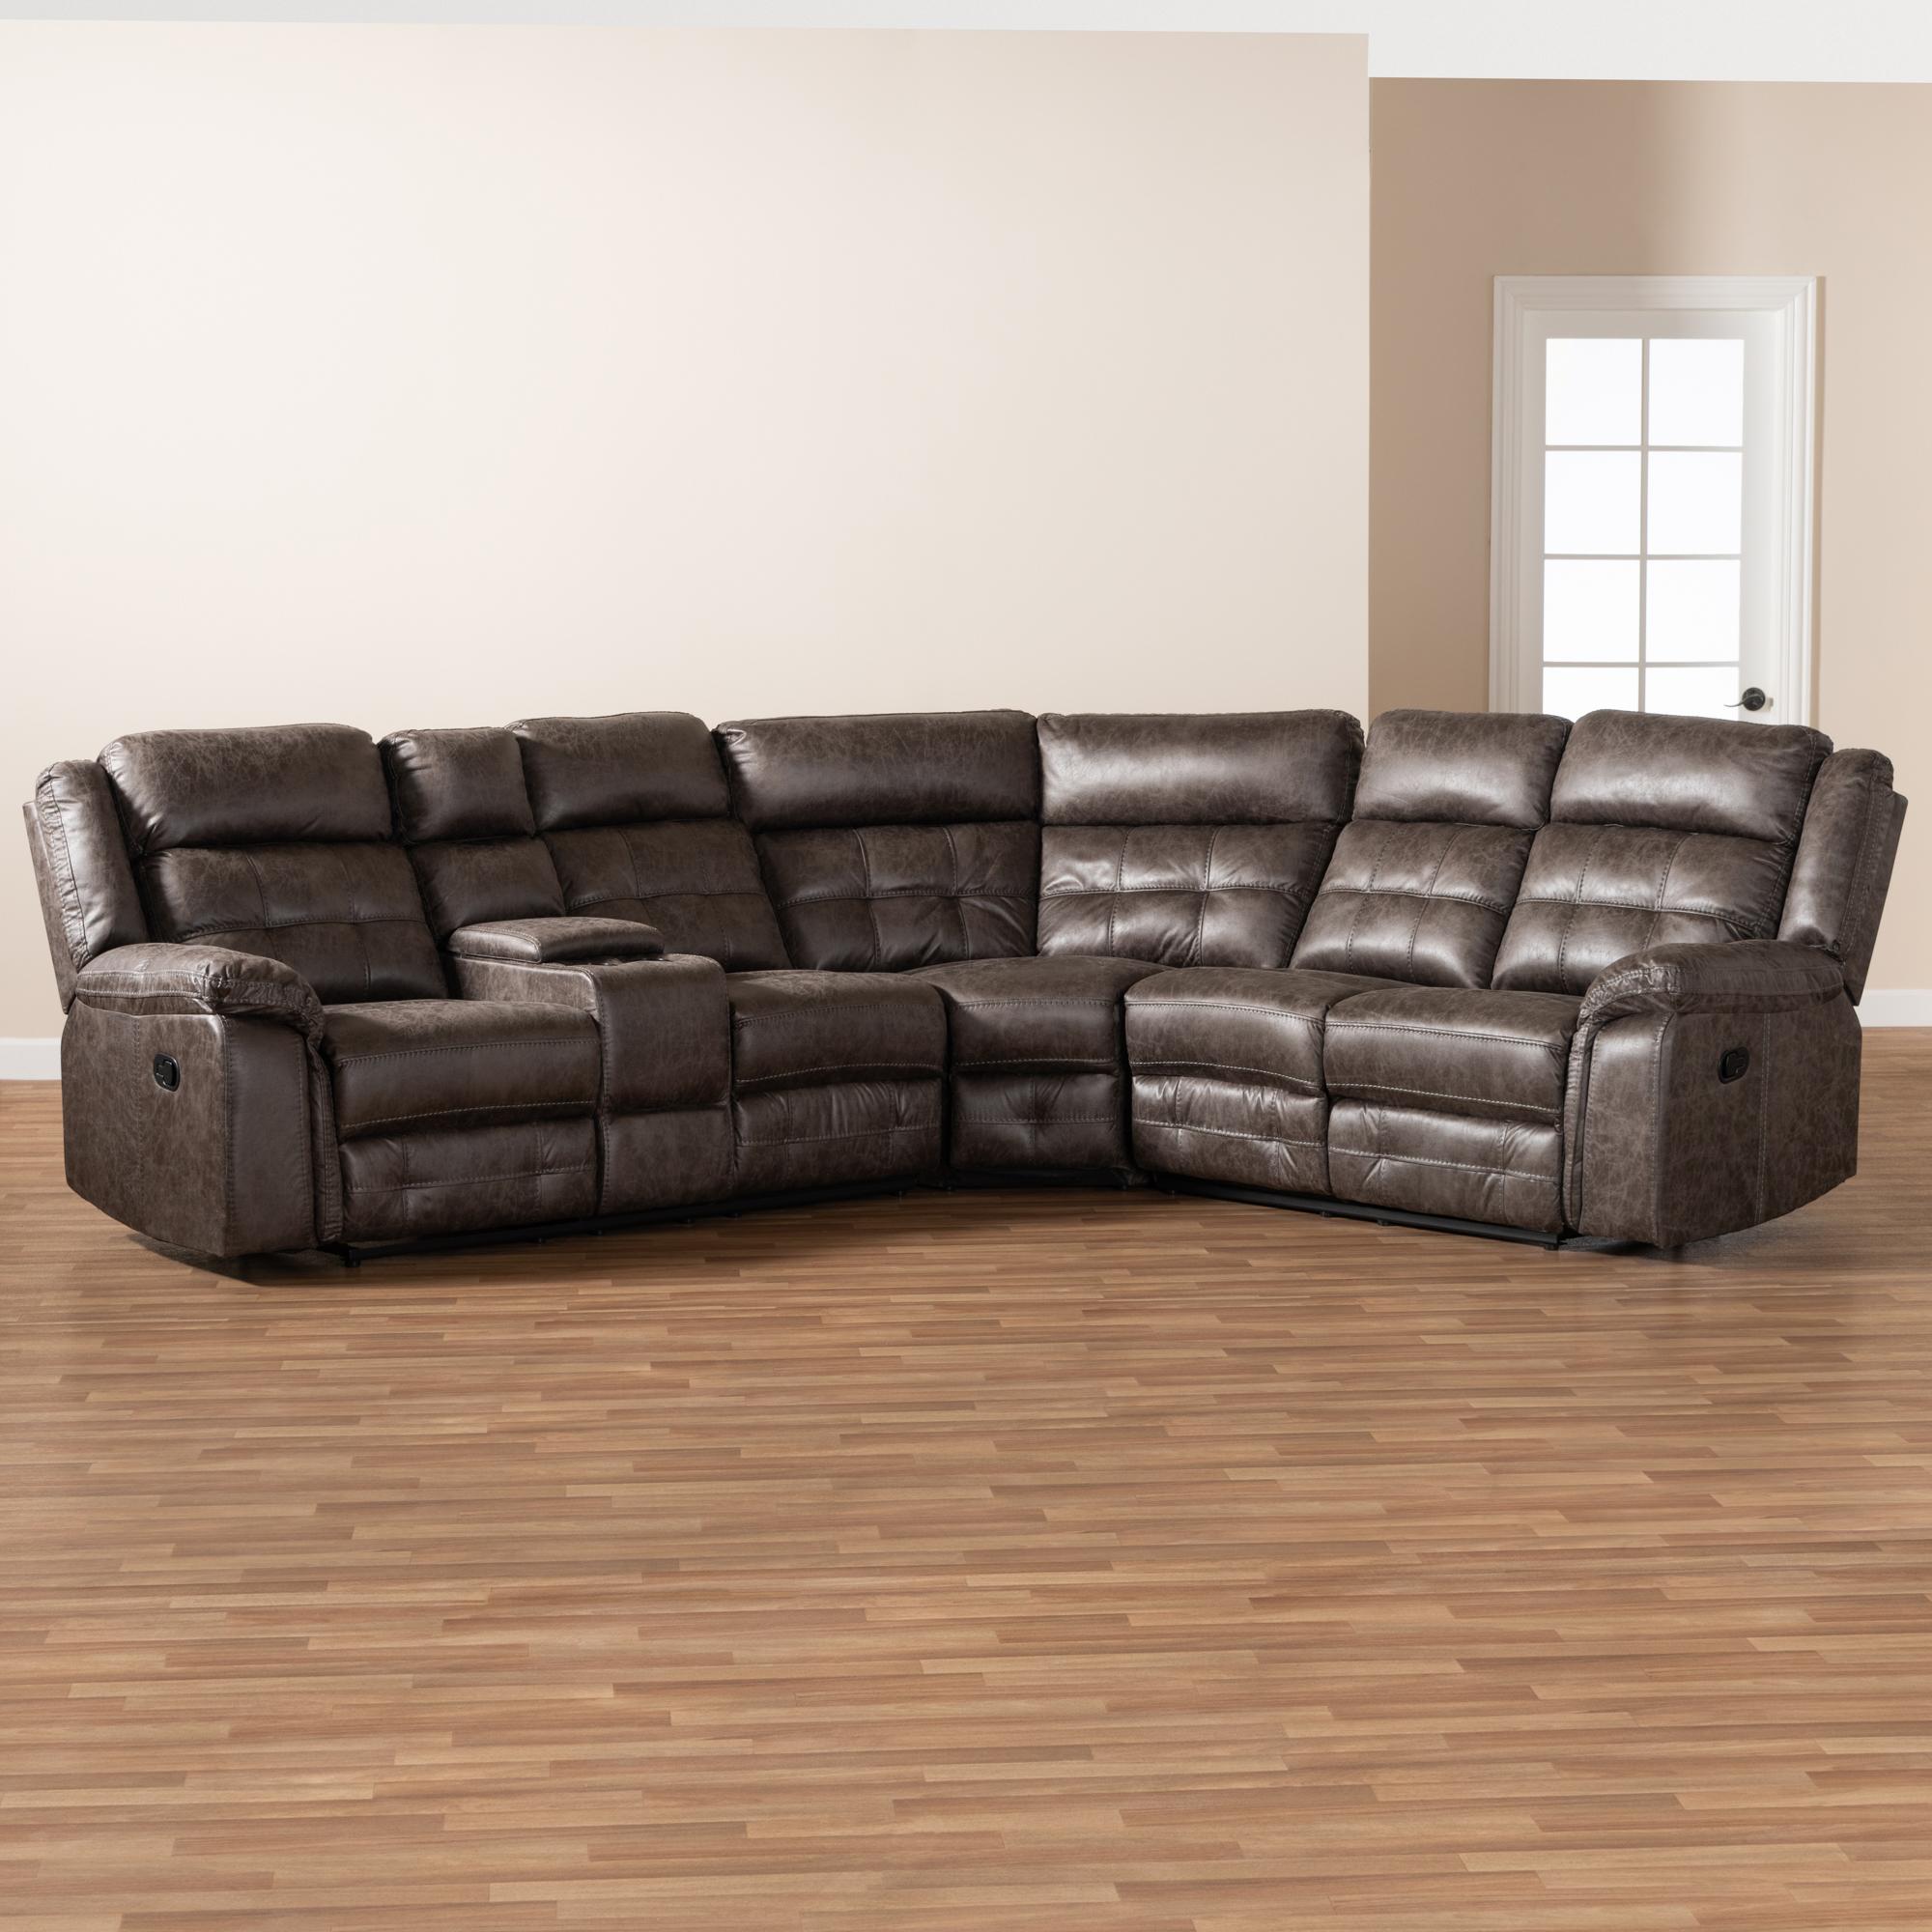 Vesa Modern Faux Leather L-Shaped 6-Piece Sectional ...